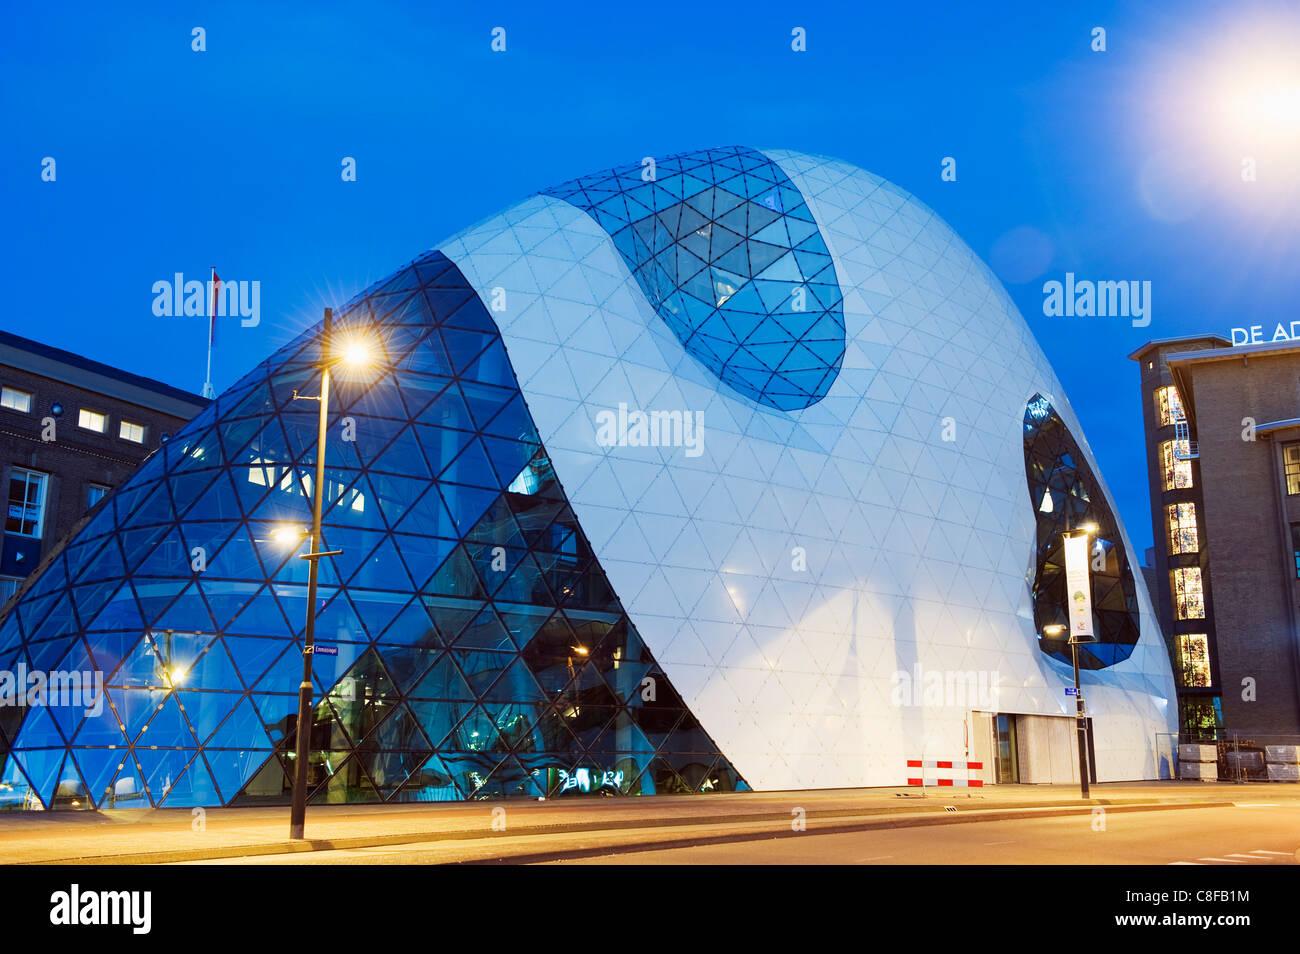 Arquitectura moderna en 18 Septemberplein diseñado por la firma arquitectónica italiana de Massimiliano Imagen De Stock